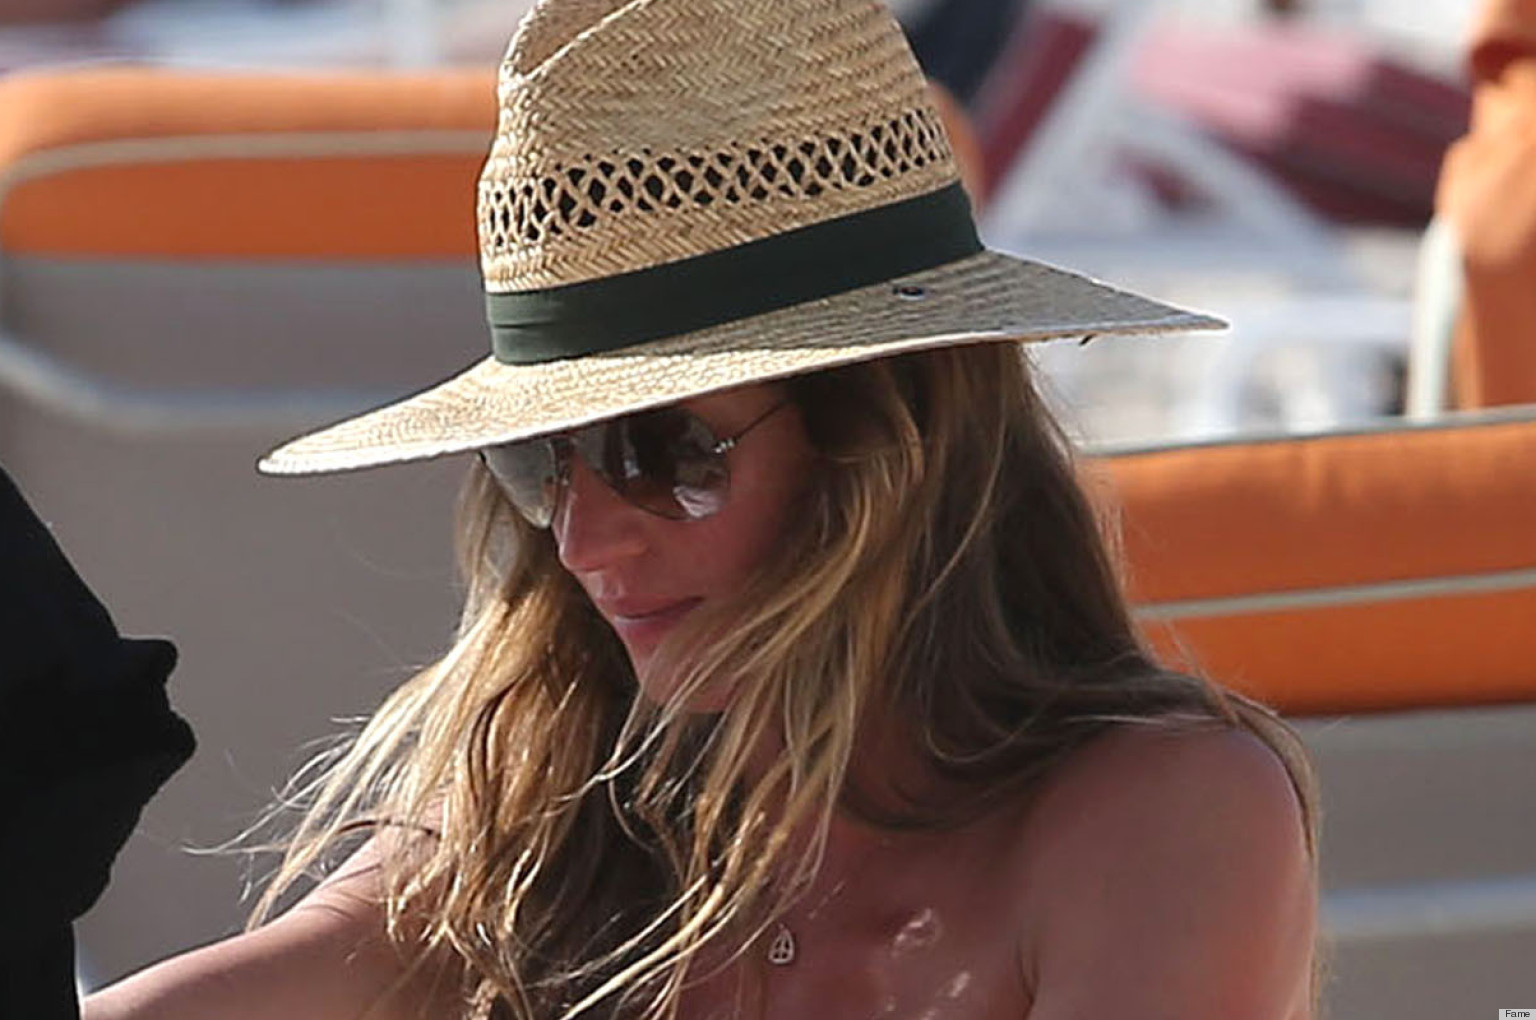 Gisele Bundchen Bikini Pictures: The Model's Baby Bump ... Gisele Bundchen Facebook